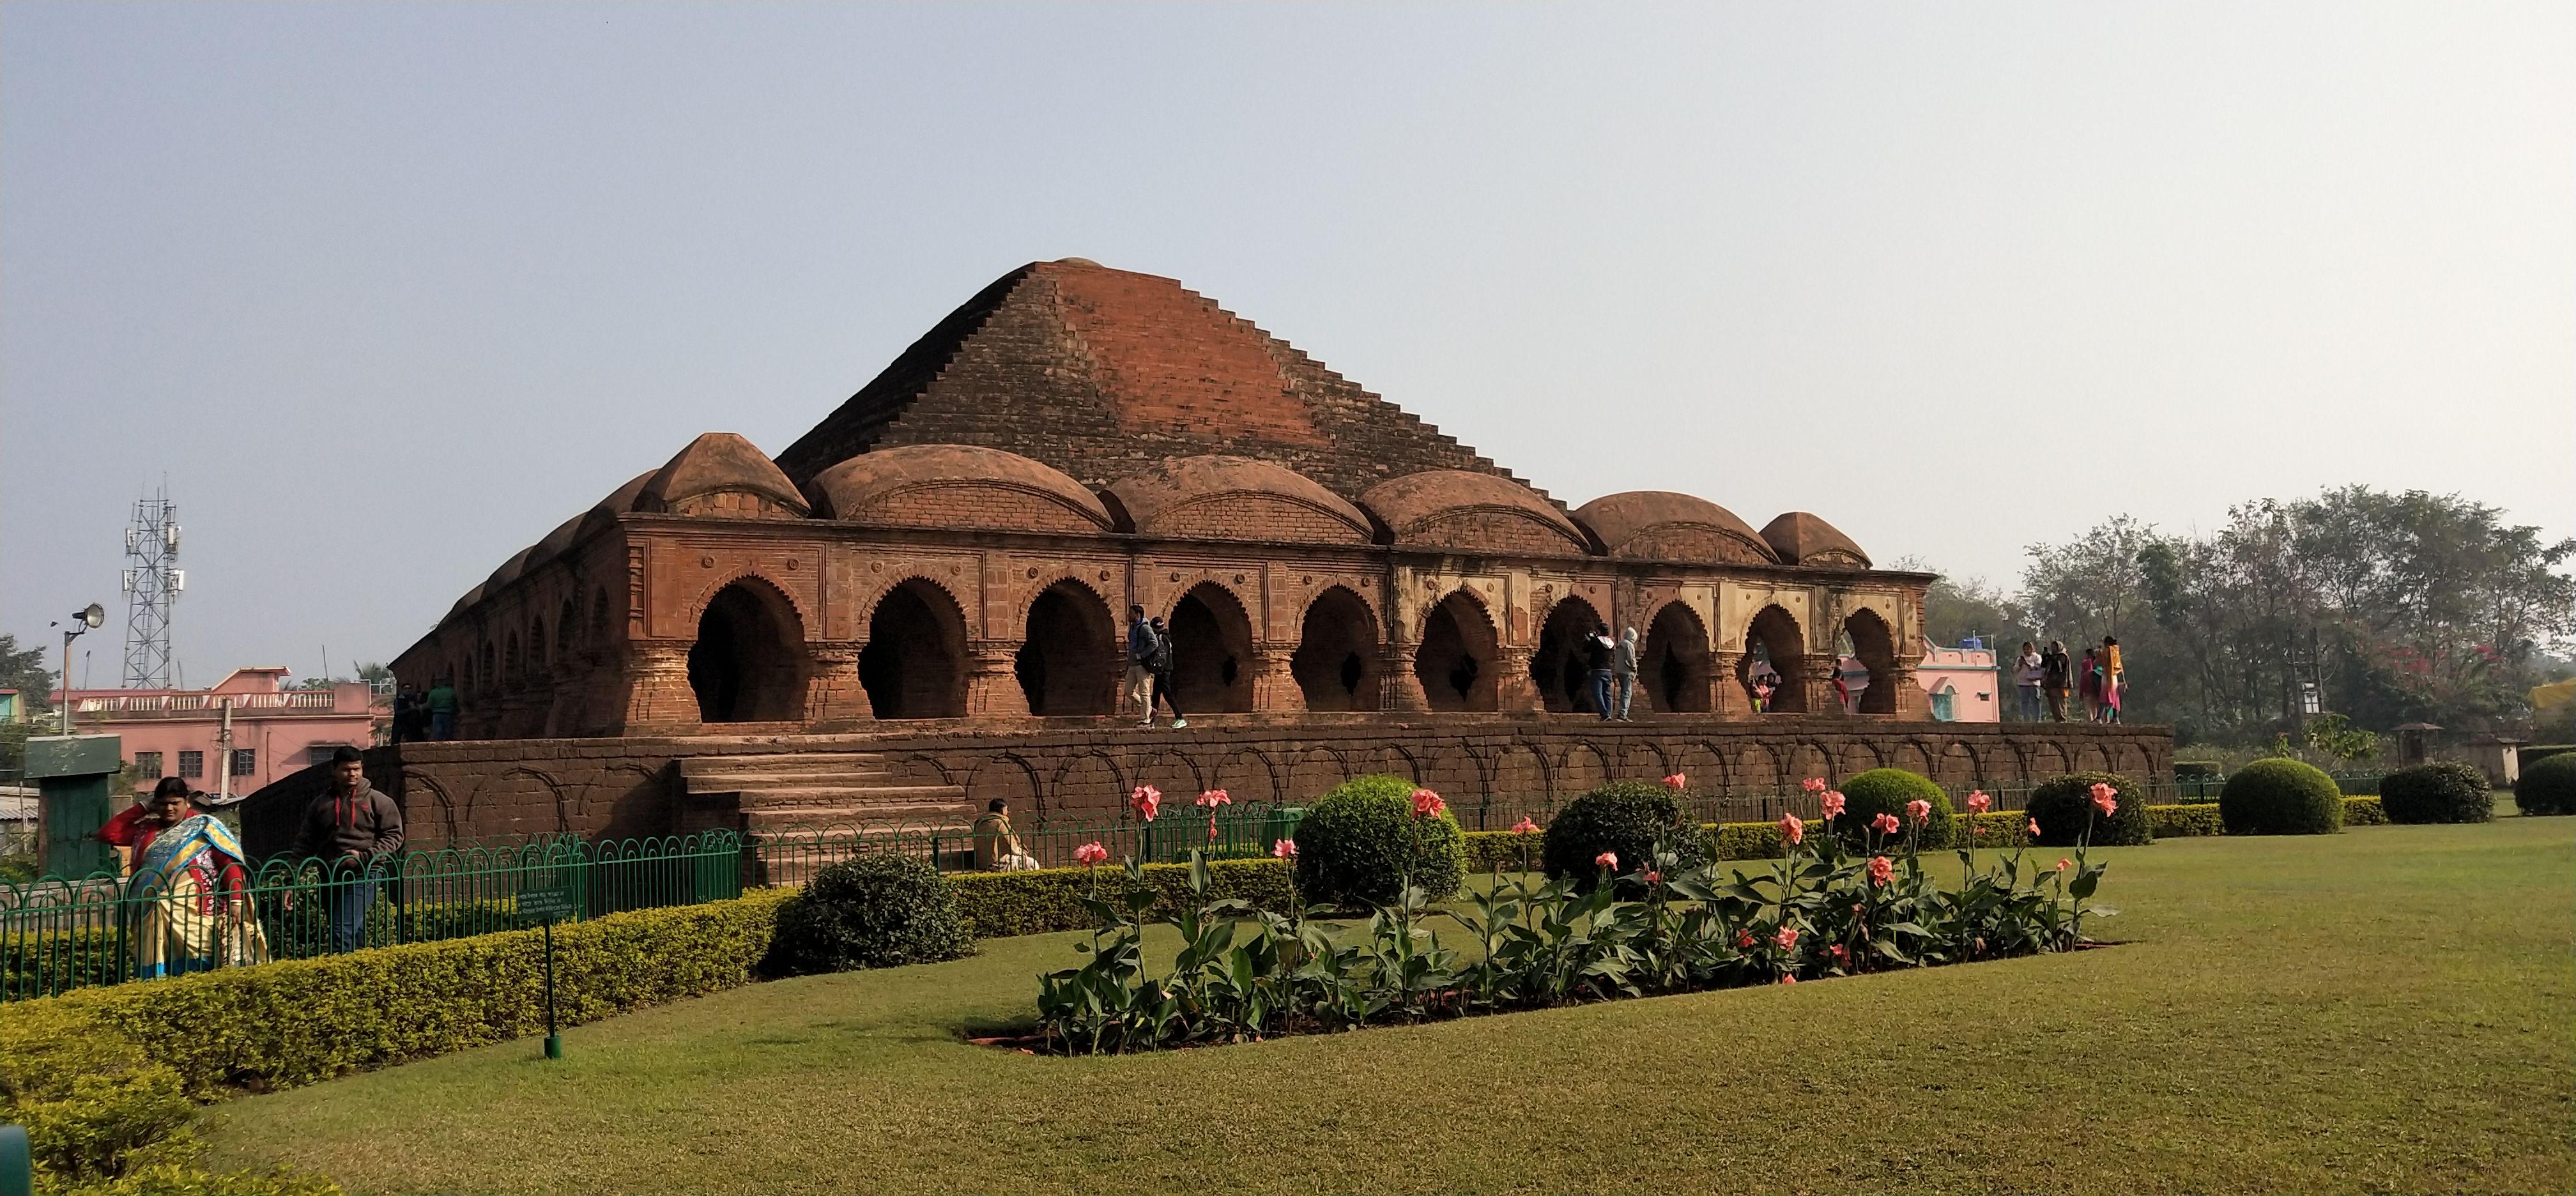 rashmancha bishnupur terracotta temple